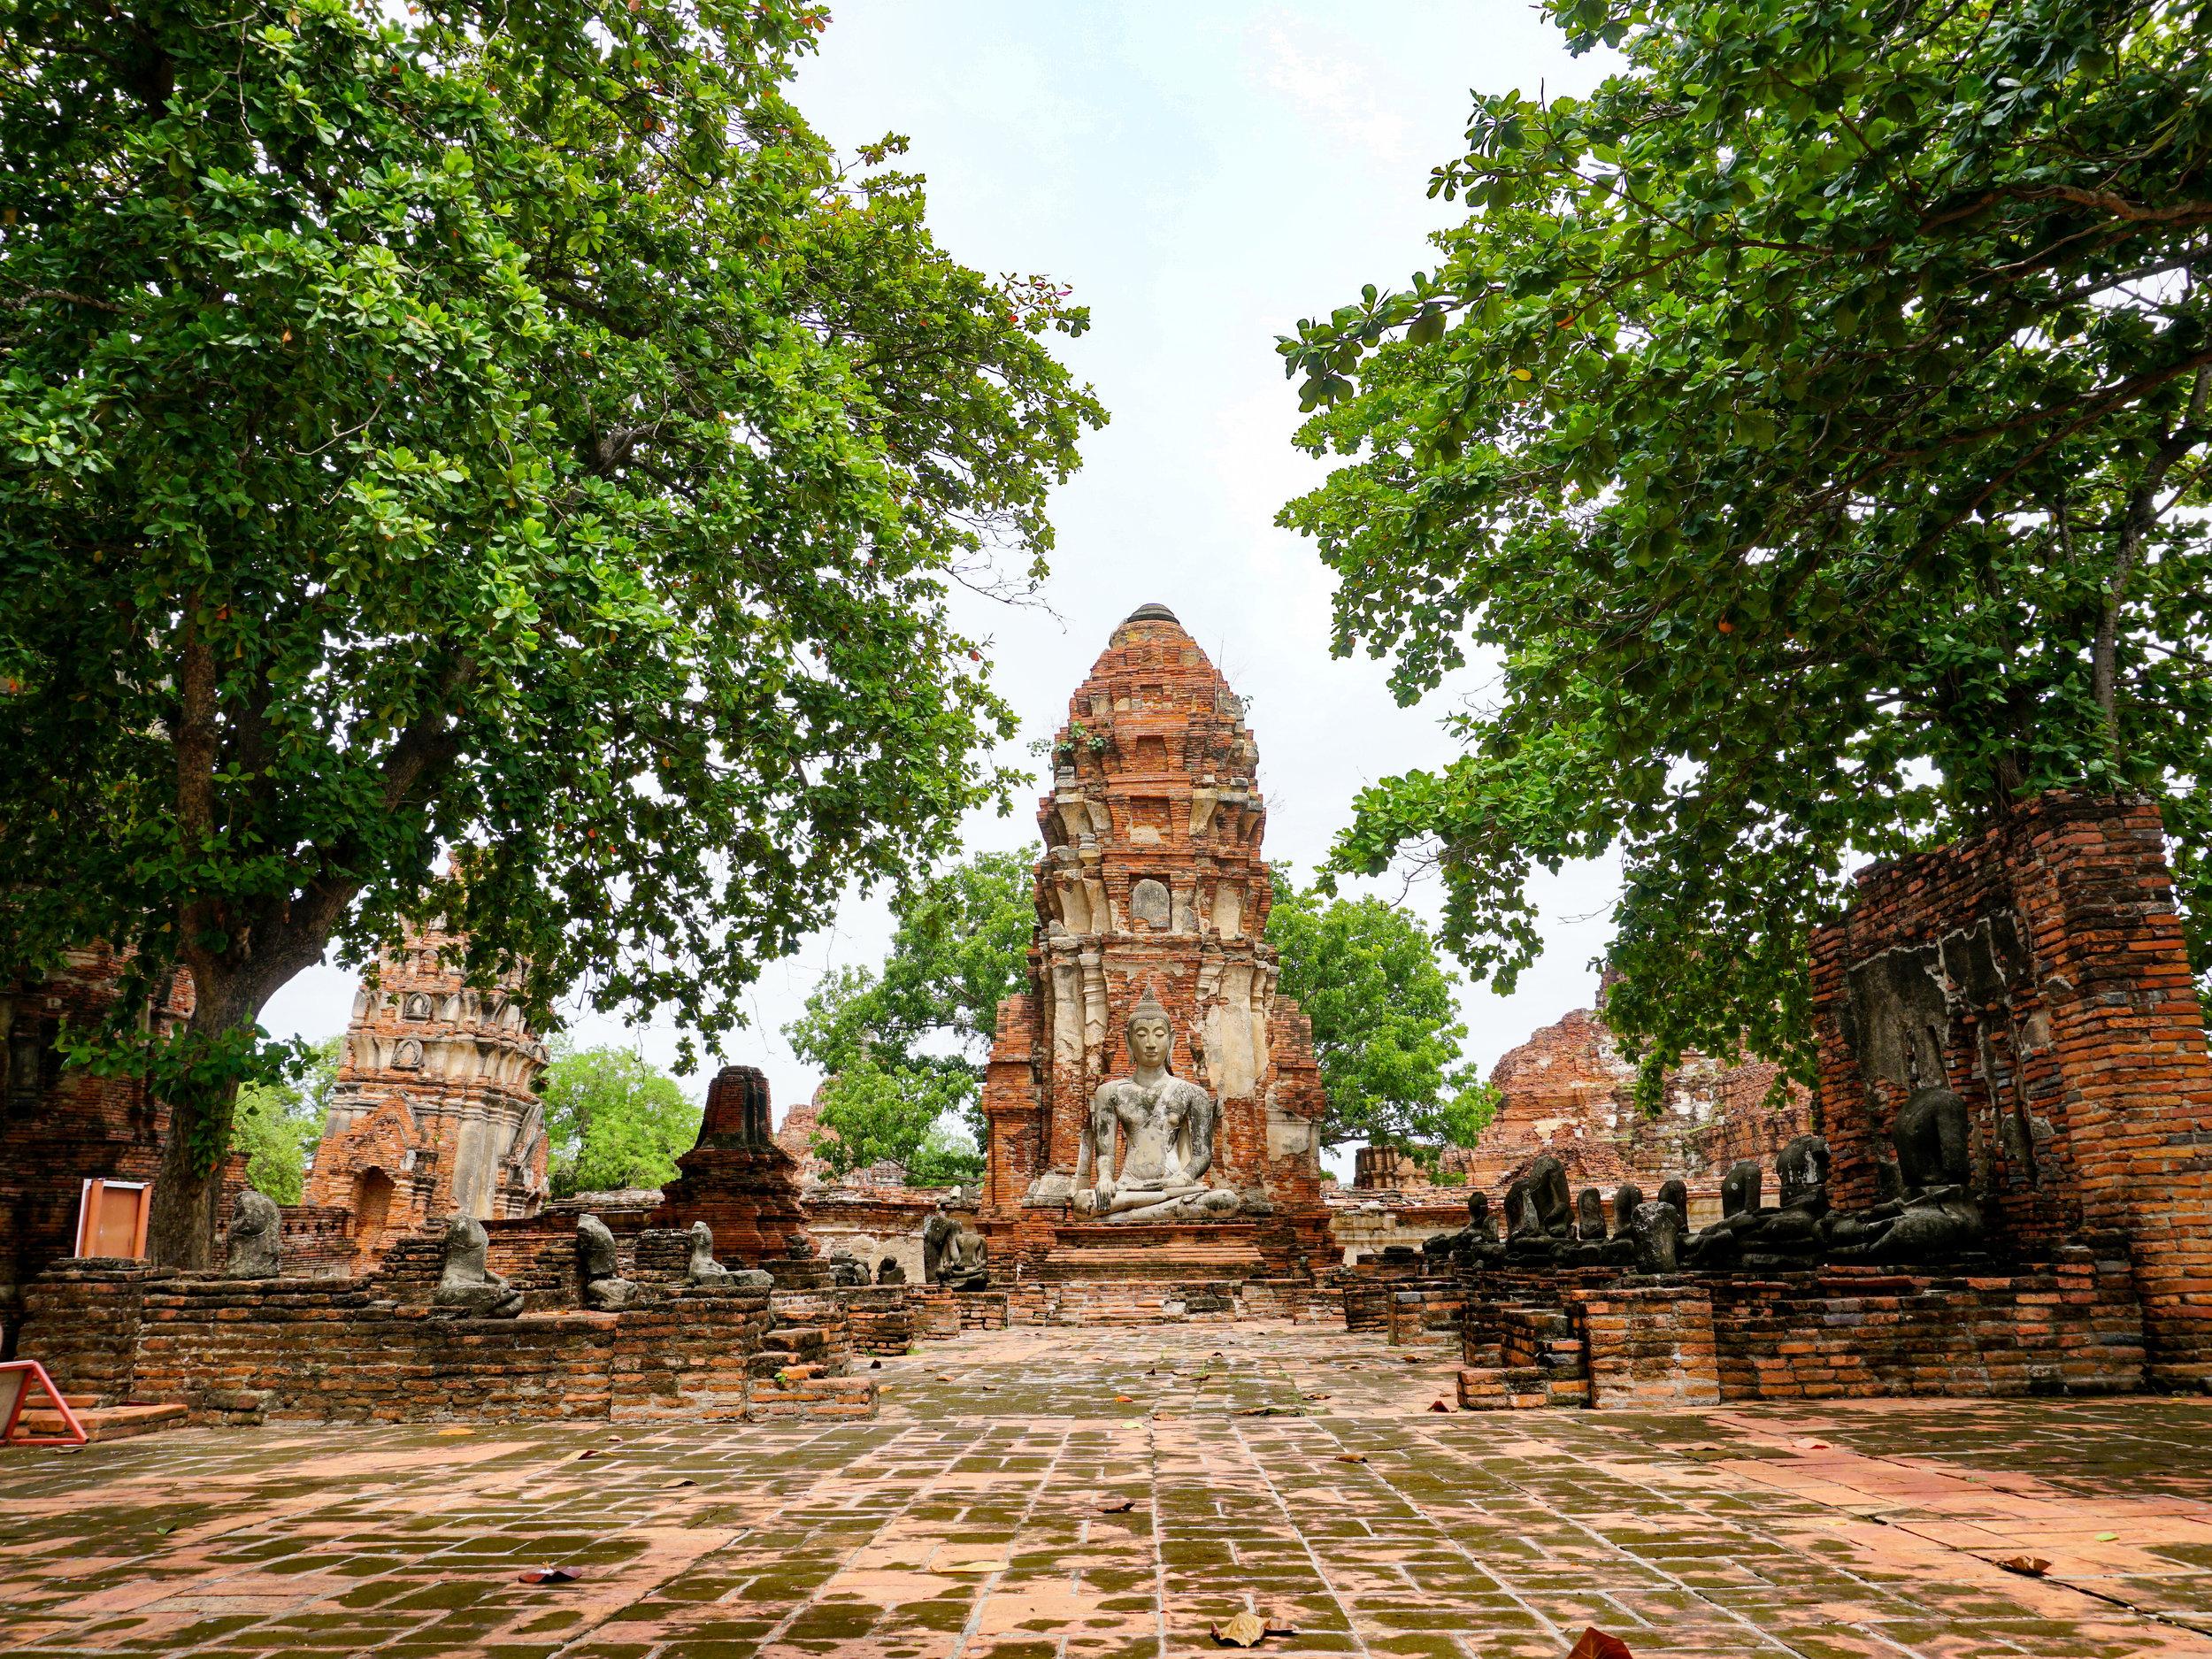 4. Ayutthaya, the ancient capital